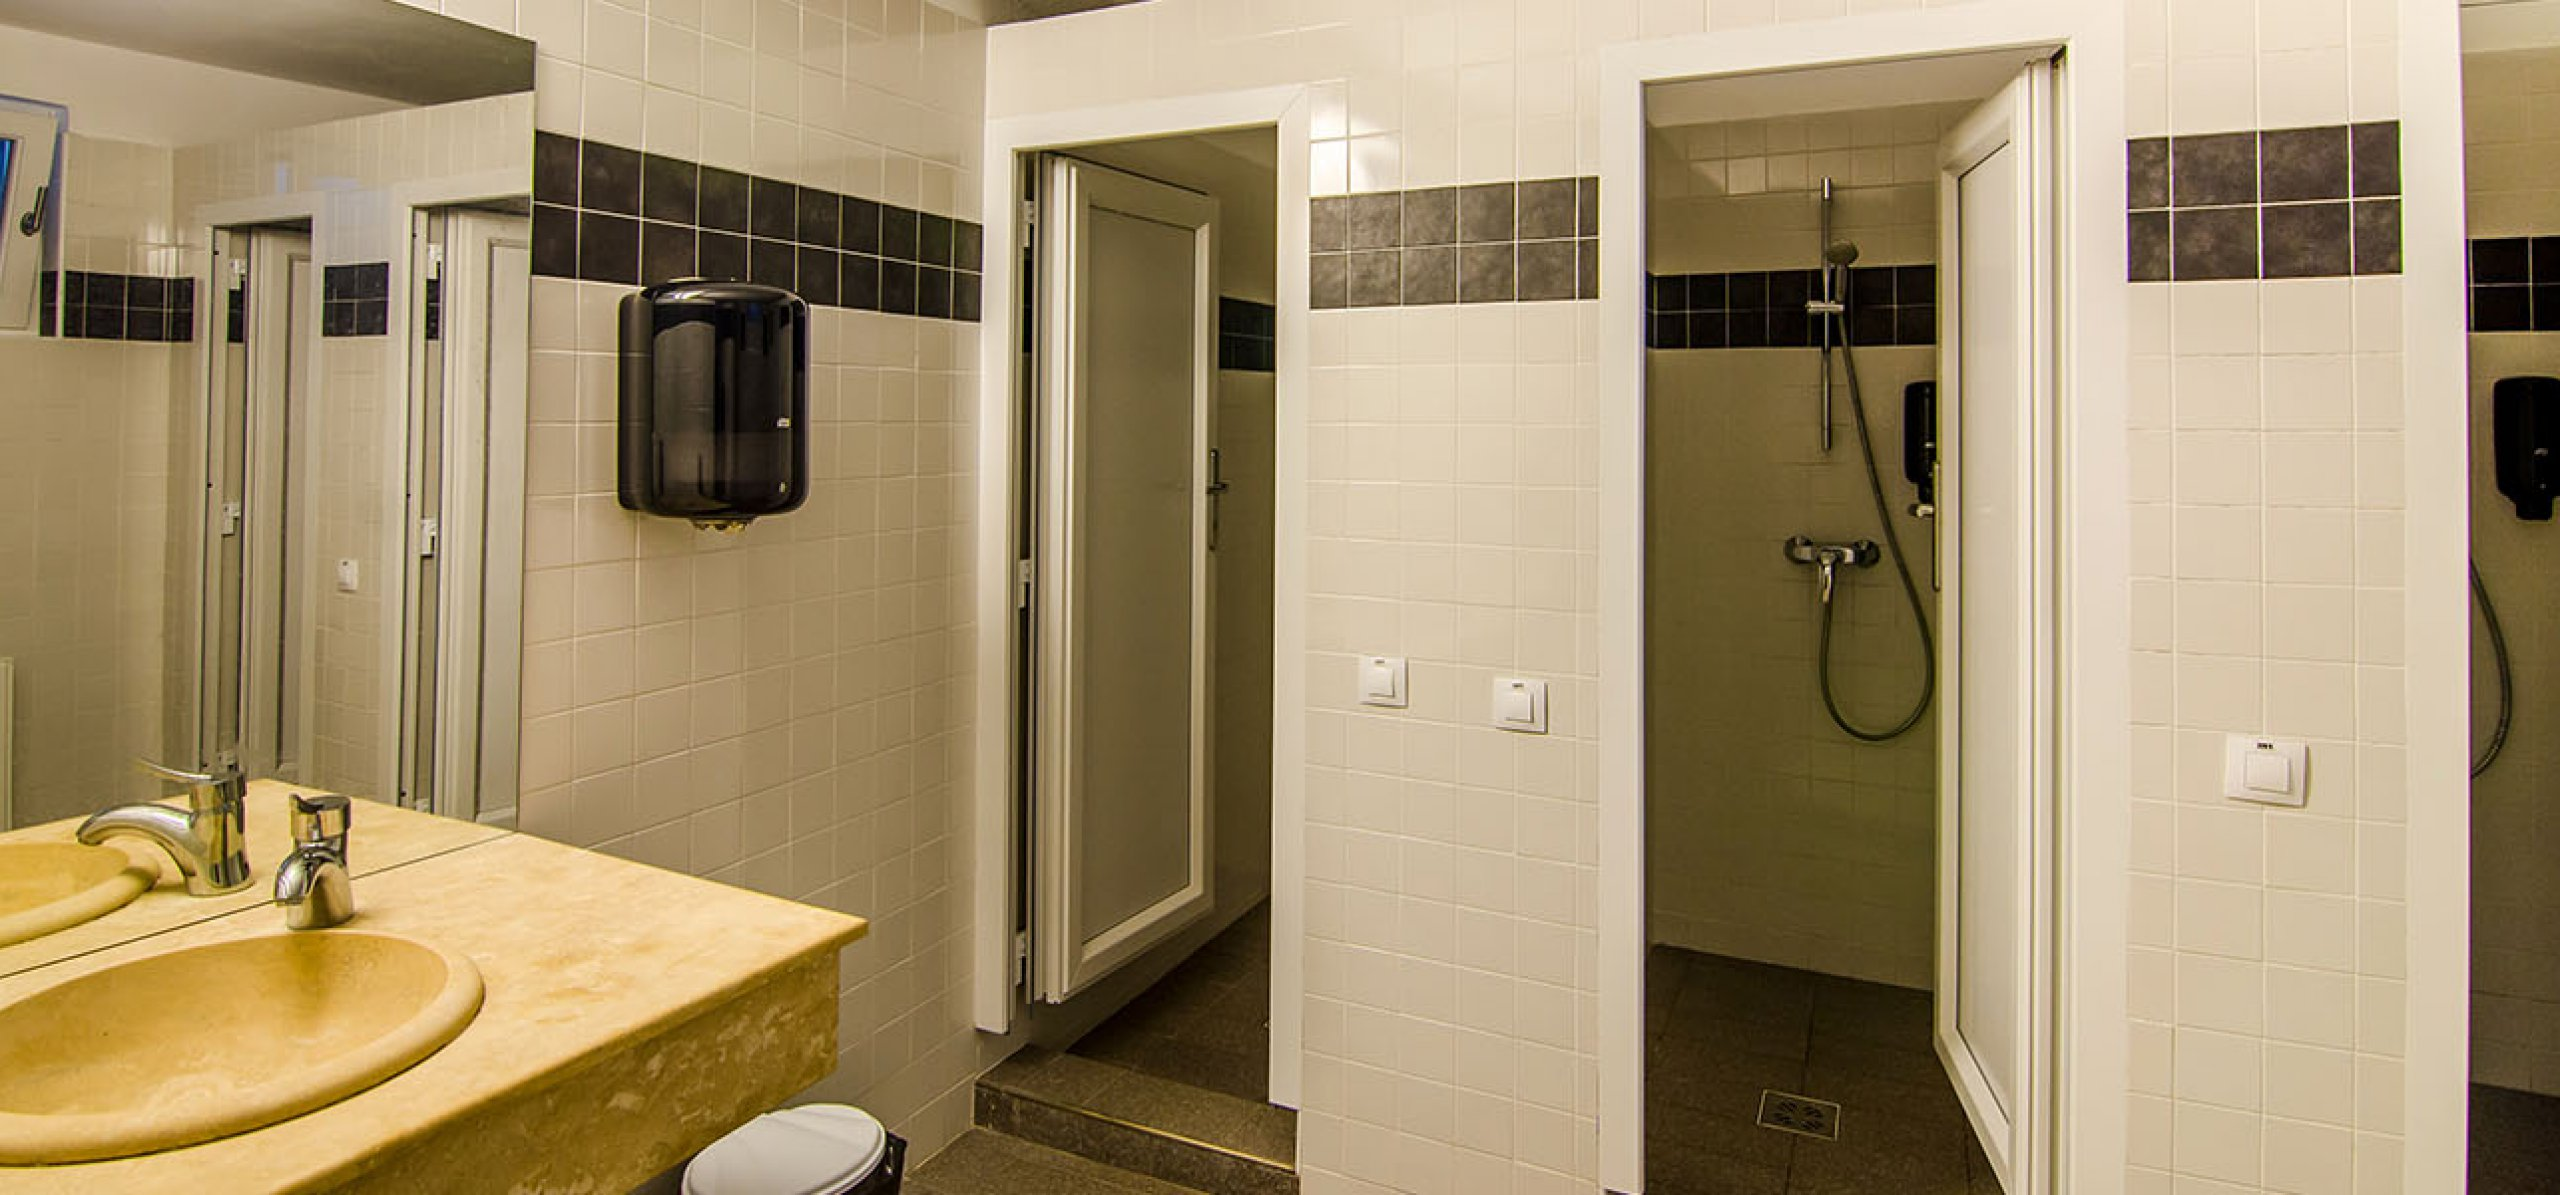 grup-sanitar-ultradotat-hotel-bucegi-2